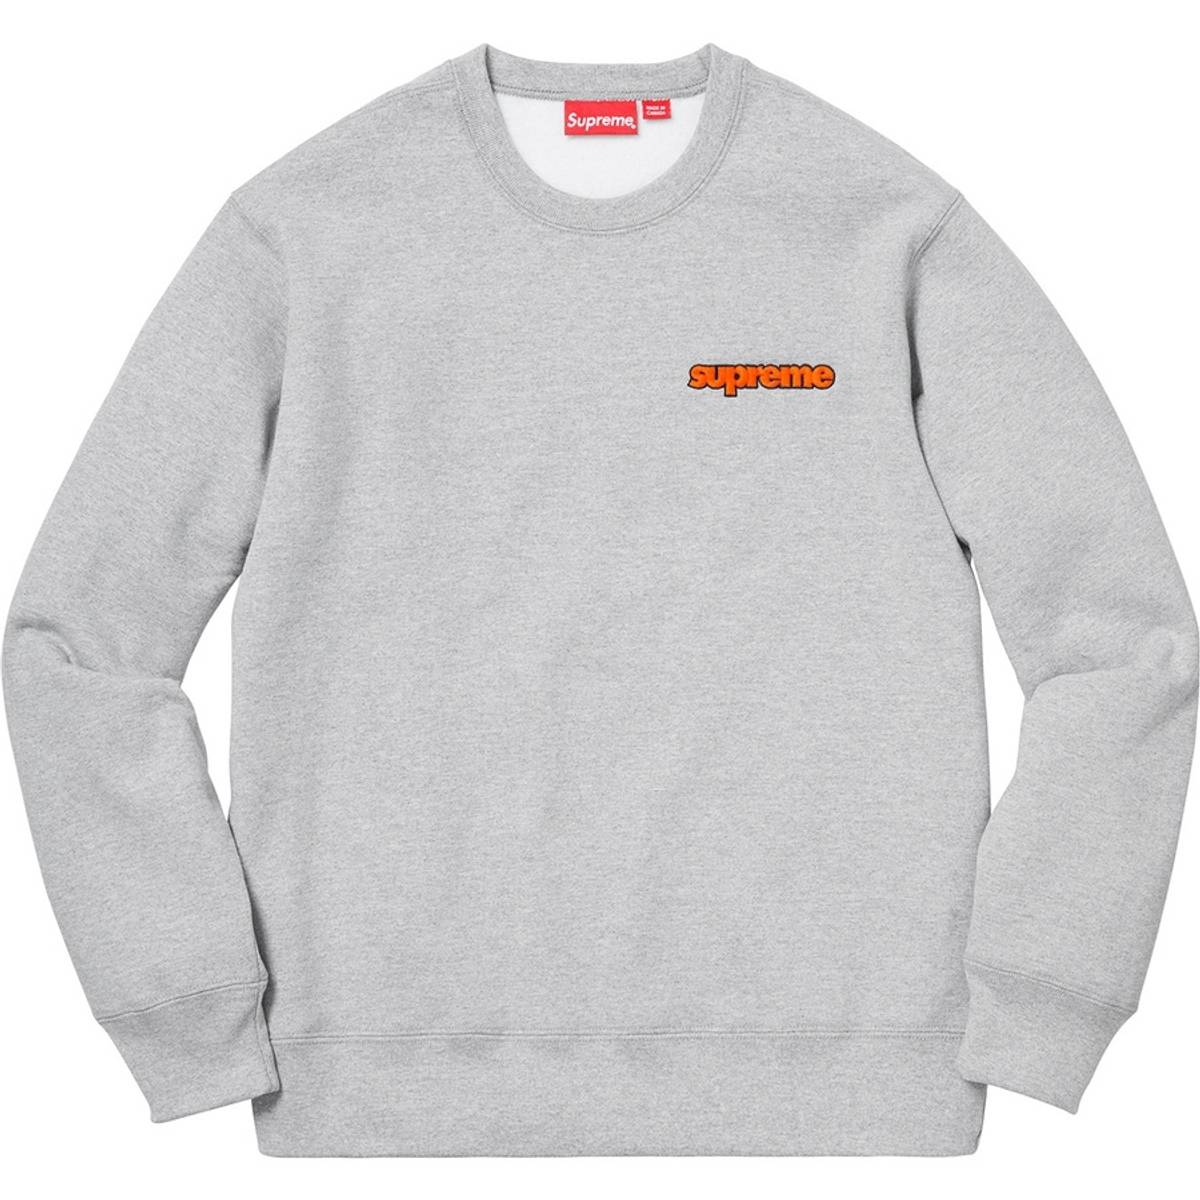 c0ba5d6b8d2 Supreme Supreme Connect Crewneck Sweatshirt   Heather Grey   Medium   Week  4 FW18 Size m - Sweatshirts   Hoodies for Sale - Grailed